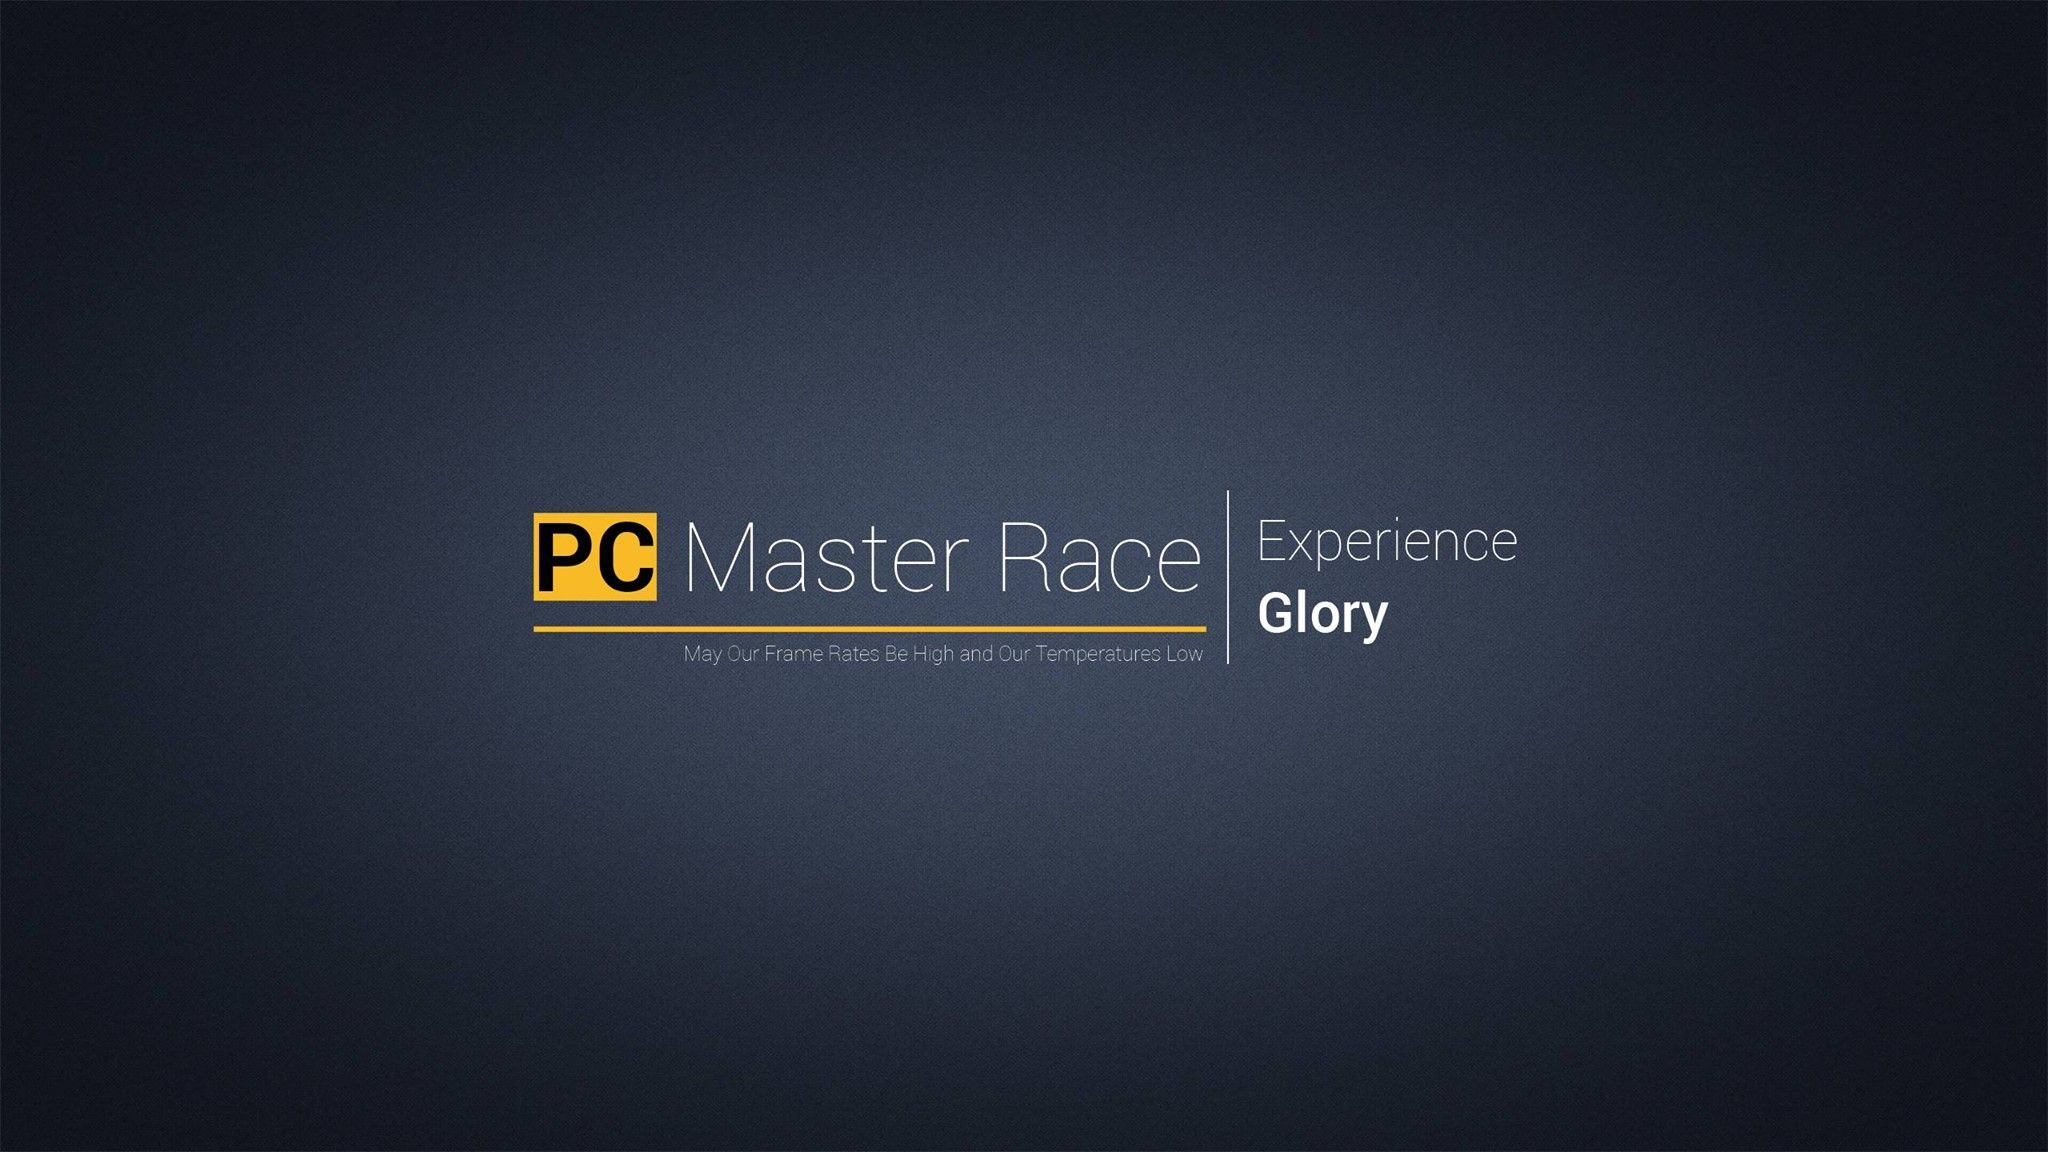 Pc Master Race Wallpaper Collection Album On Imgur Wallpaper